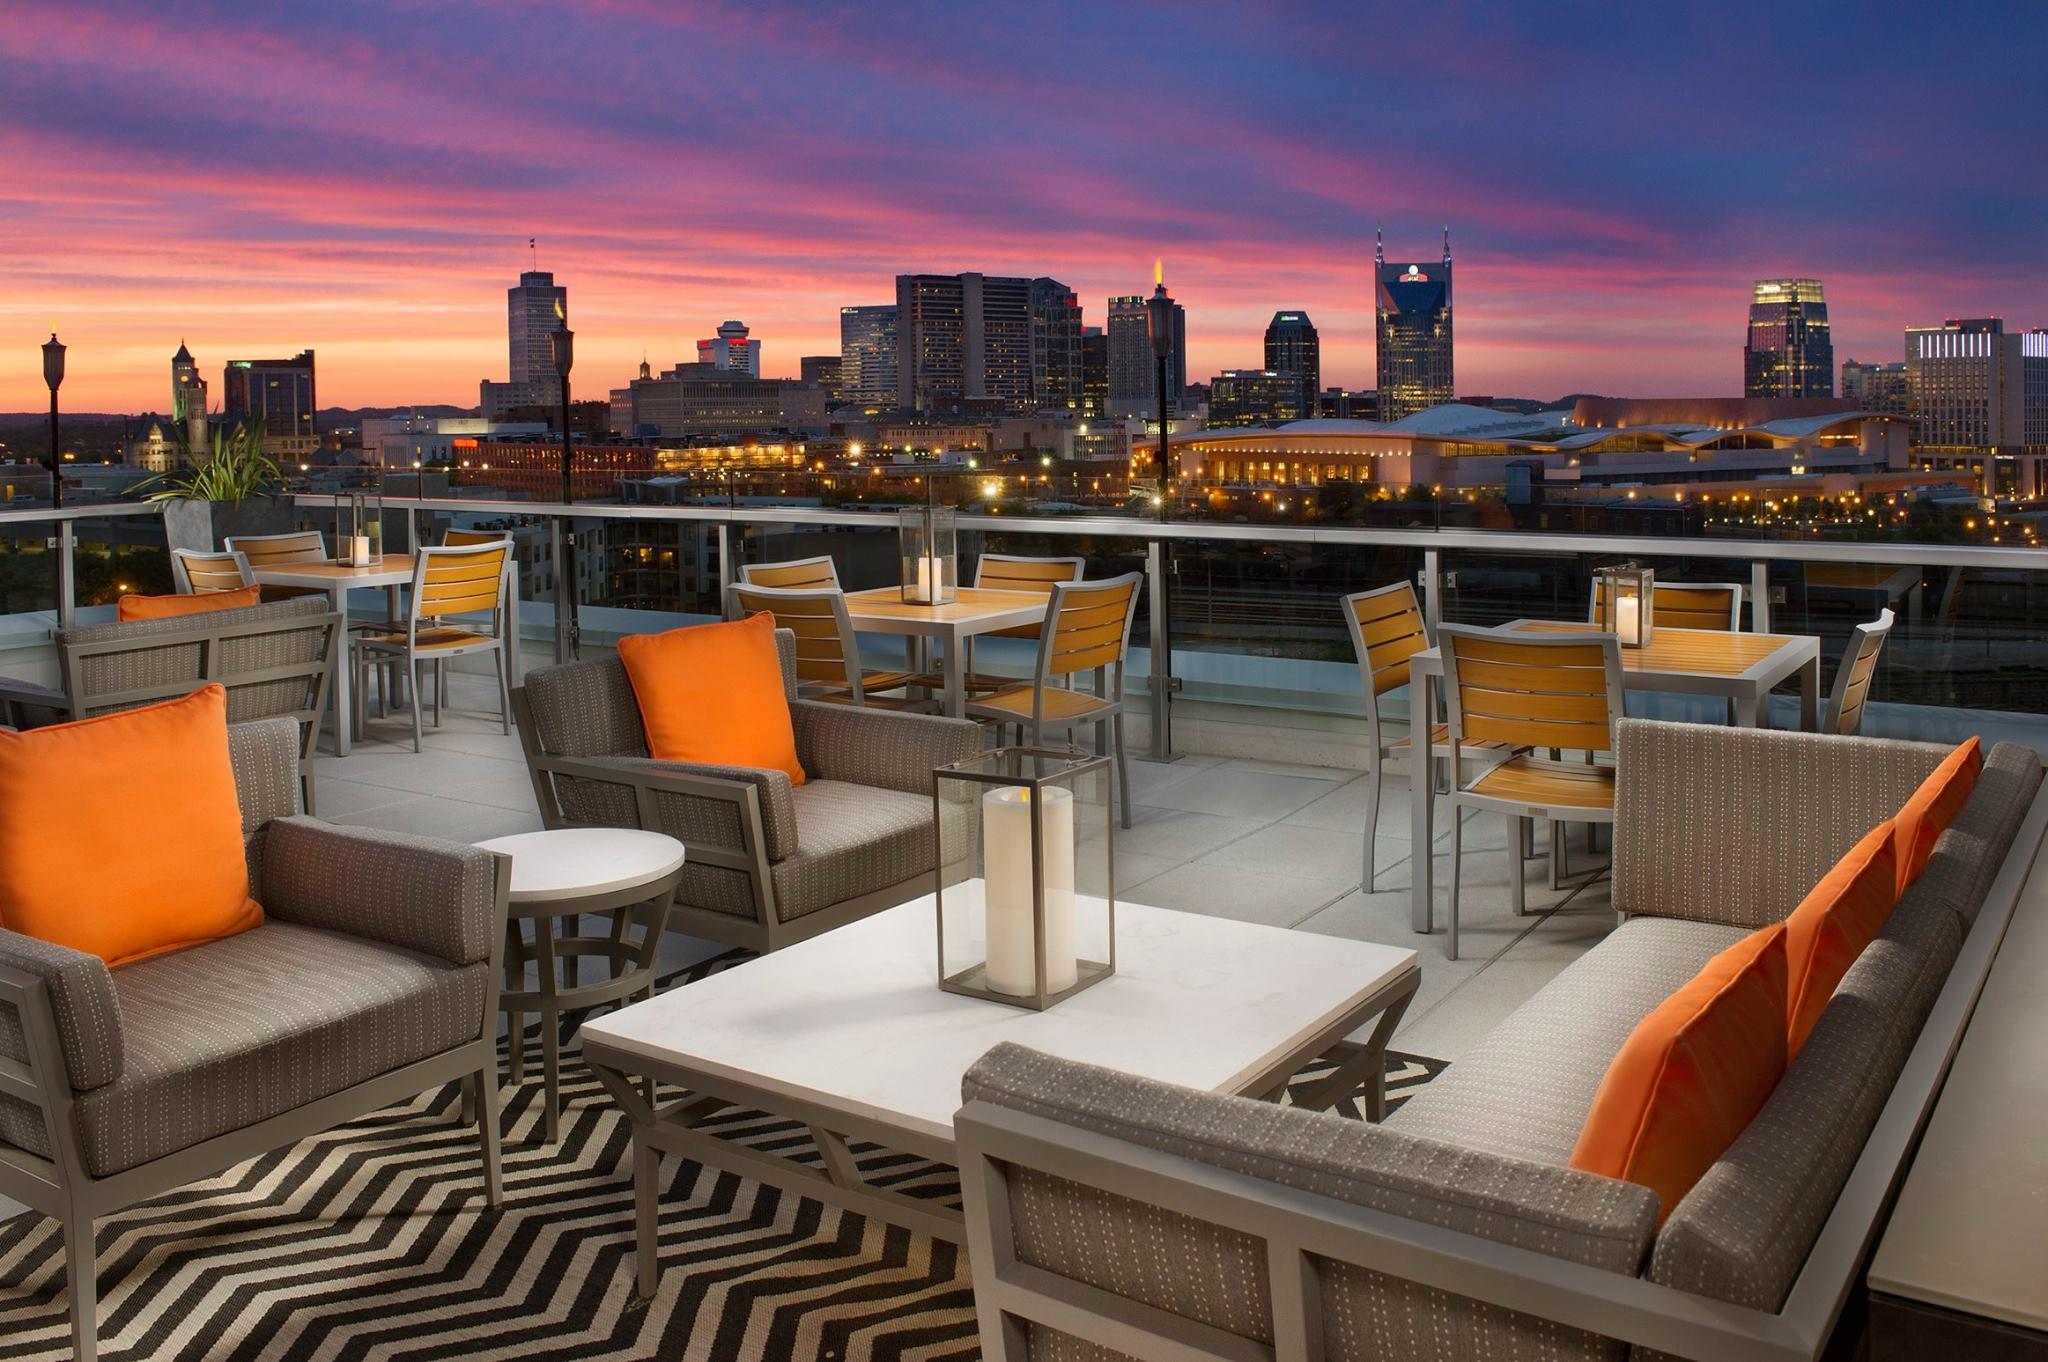 Up Rooftop Lounge The Best Rooftop Restaurant In Nashville